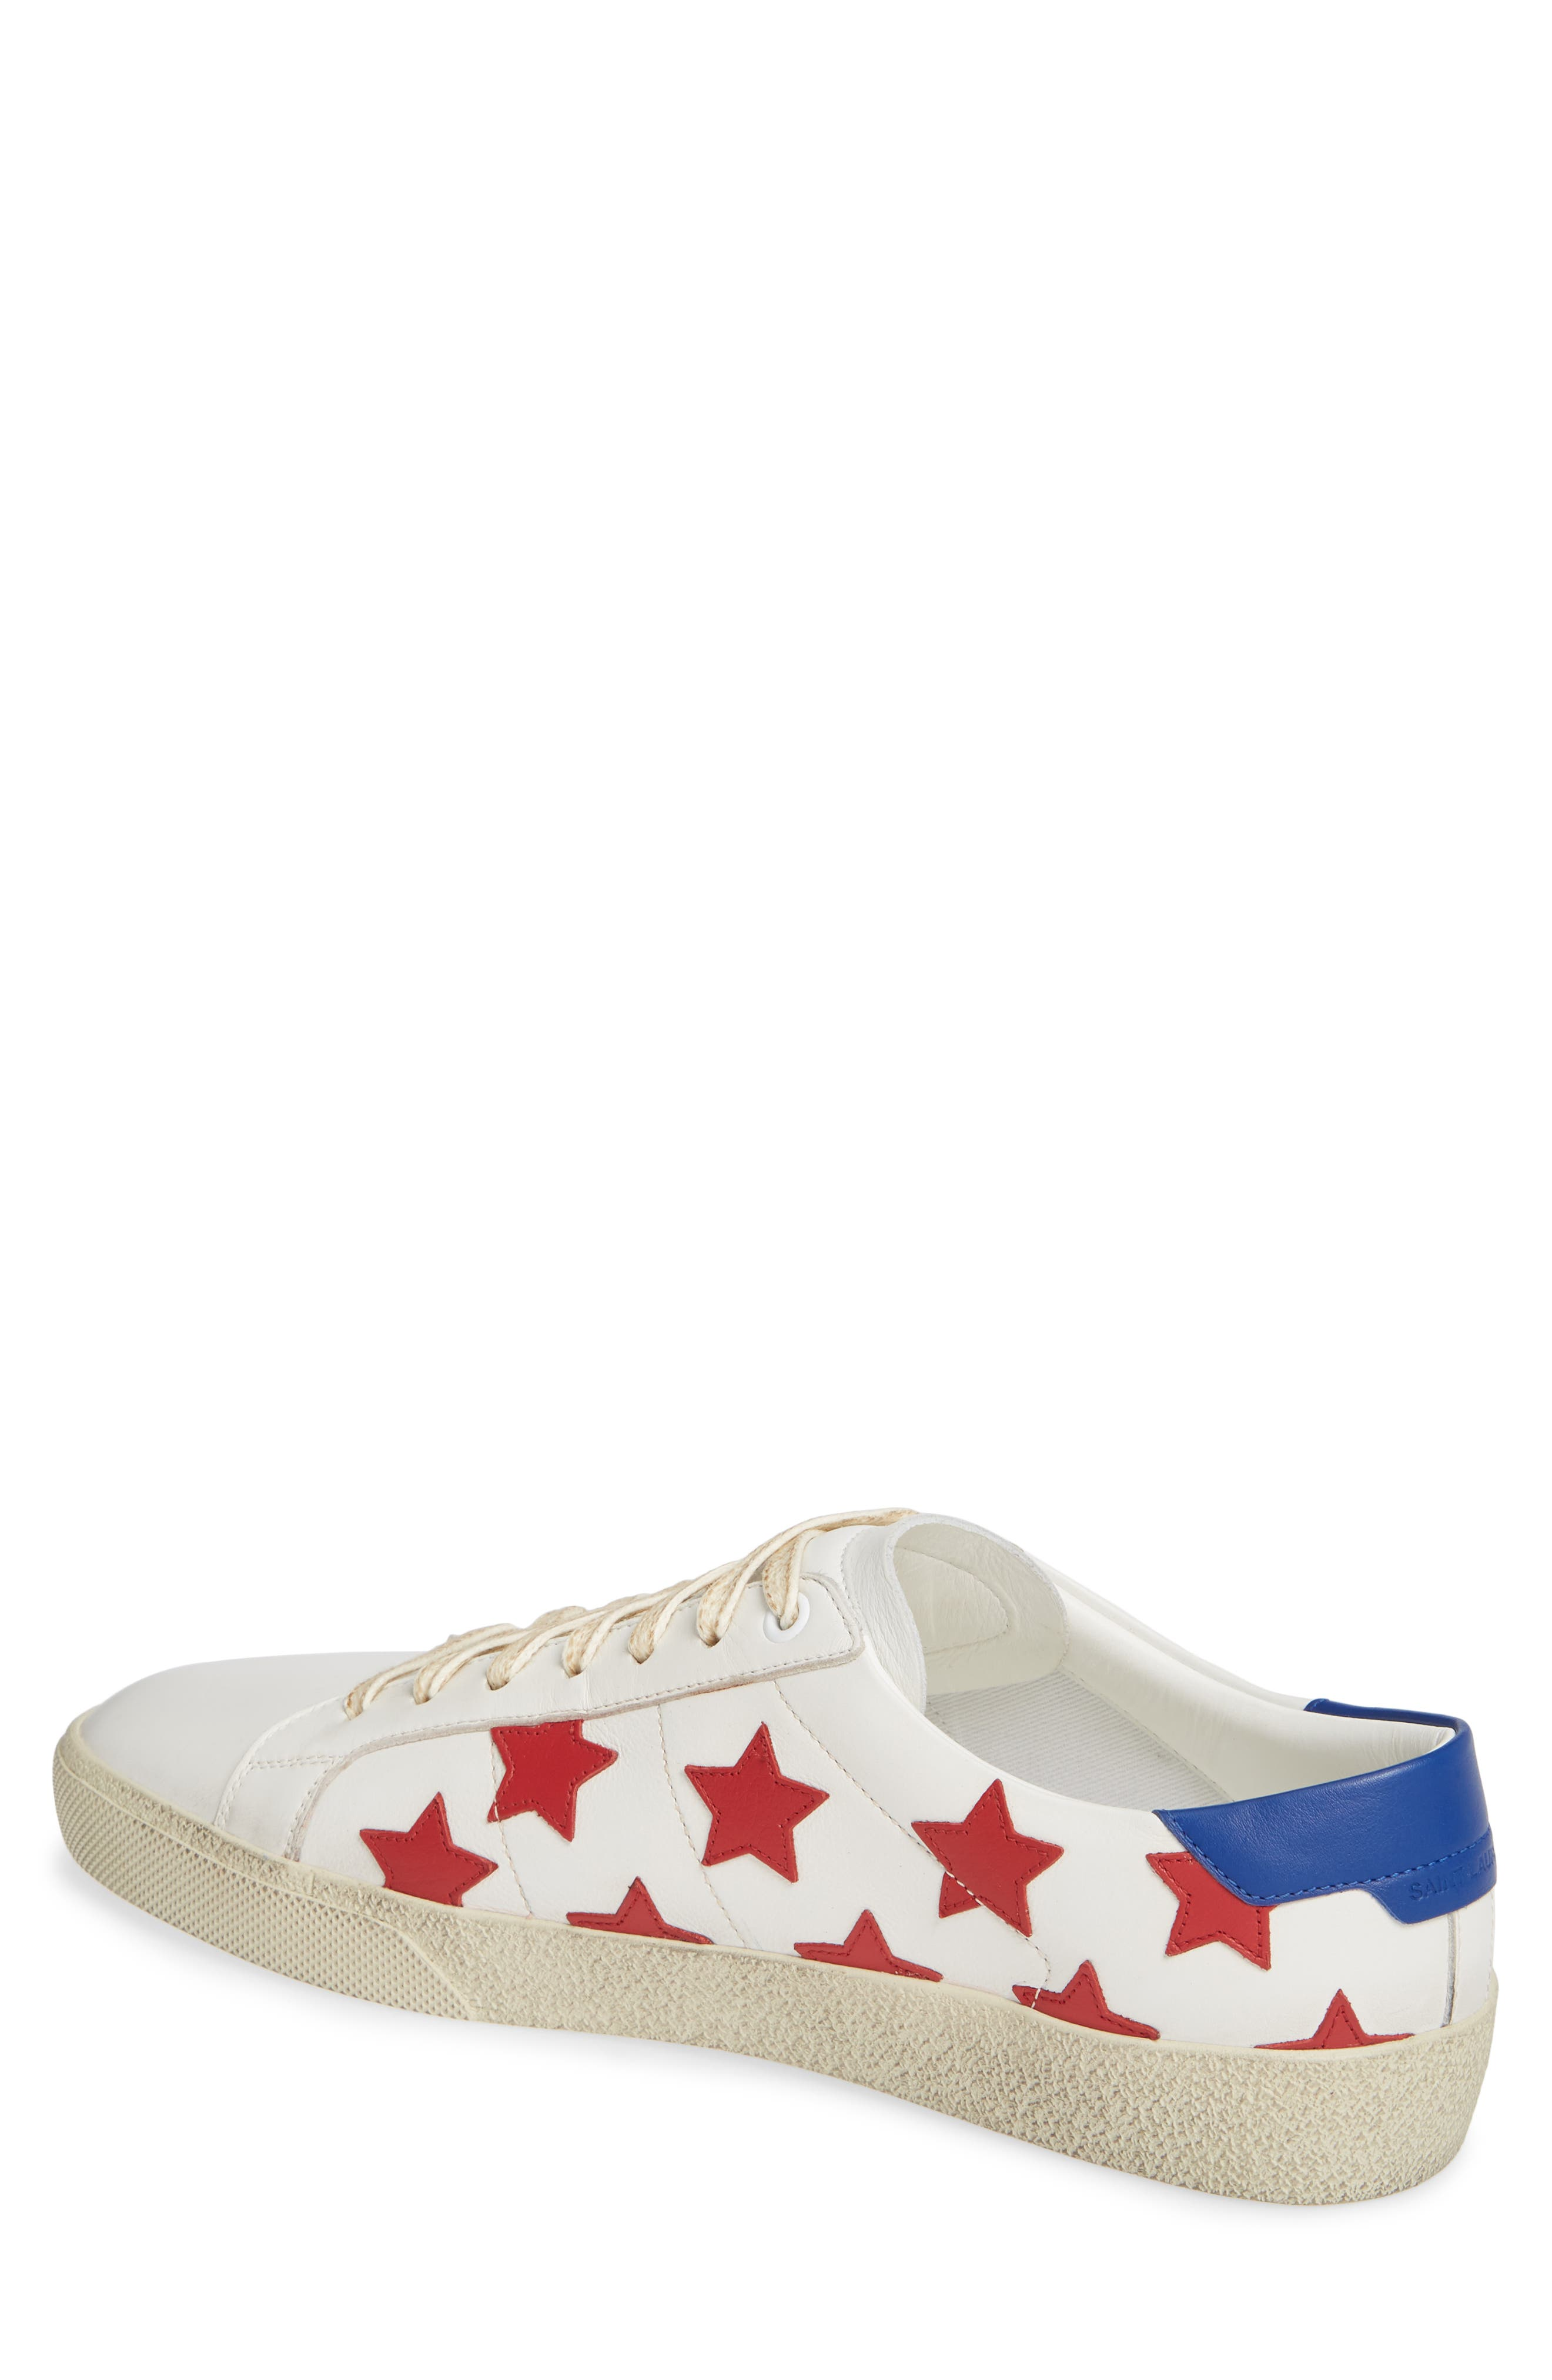 SAINT LAURENT,                             Star Low-Top Sneaker,                             Alternate thumbnail 2, color,                             WHITE/ MULTI